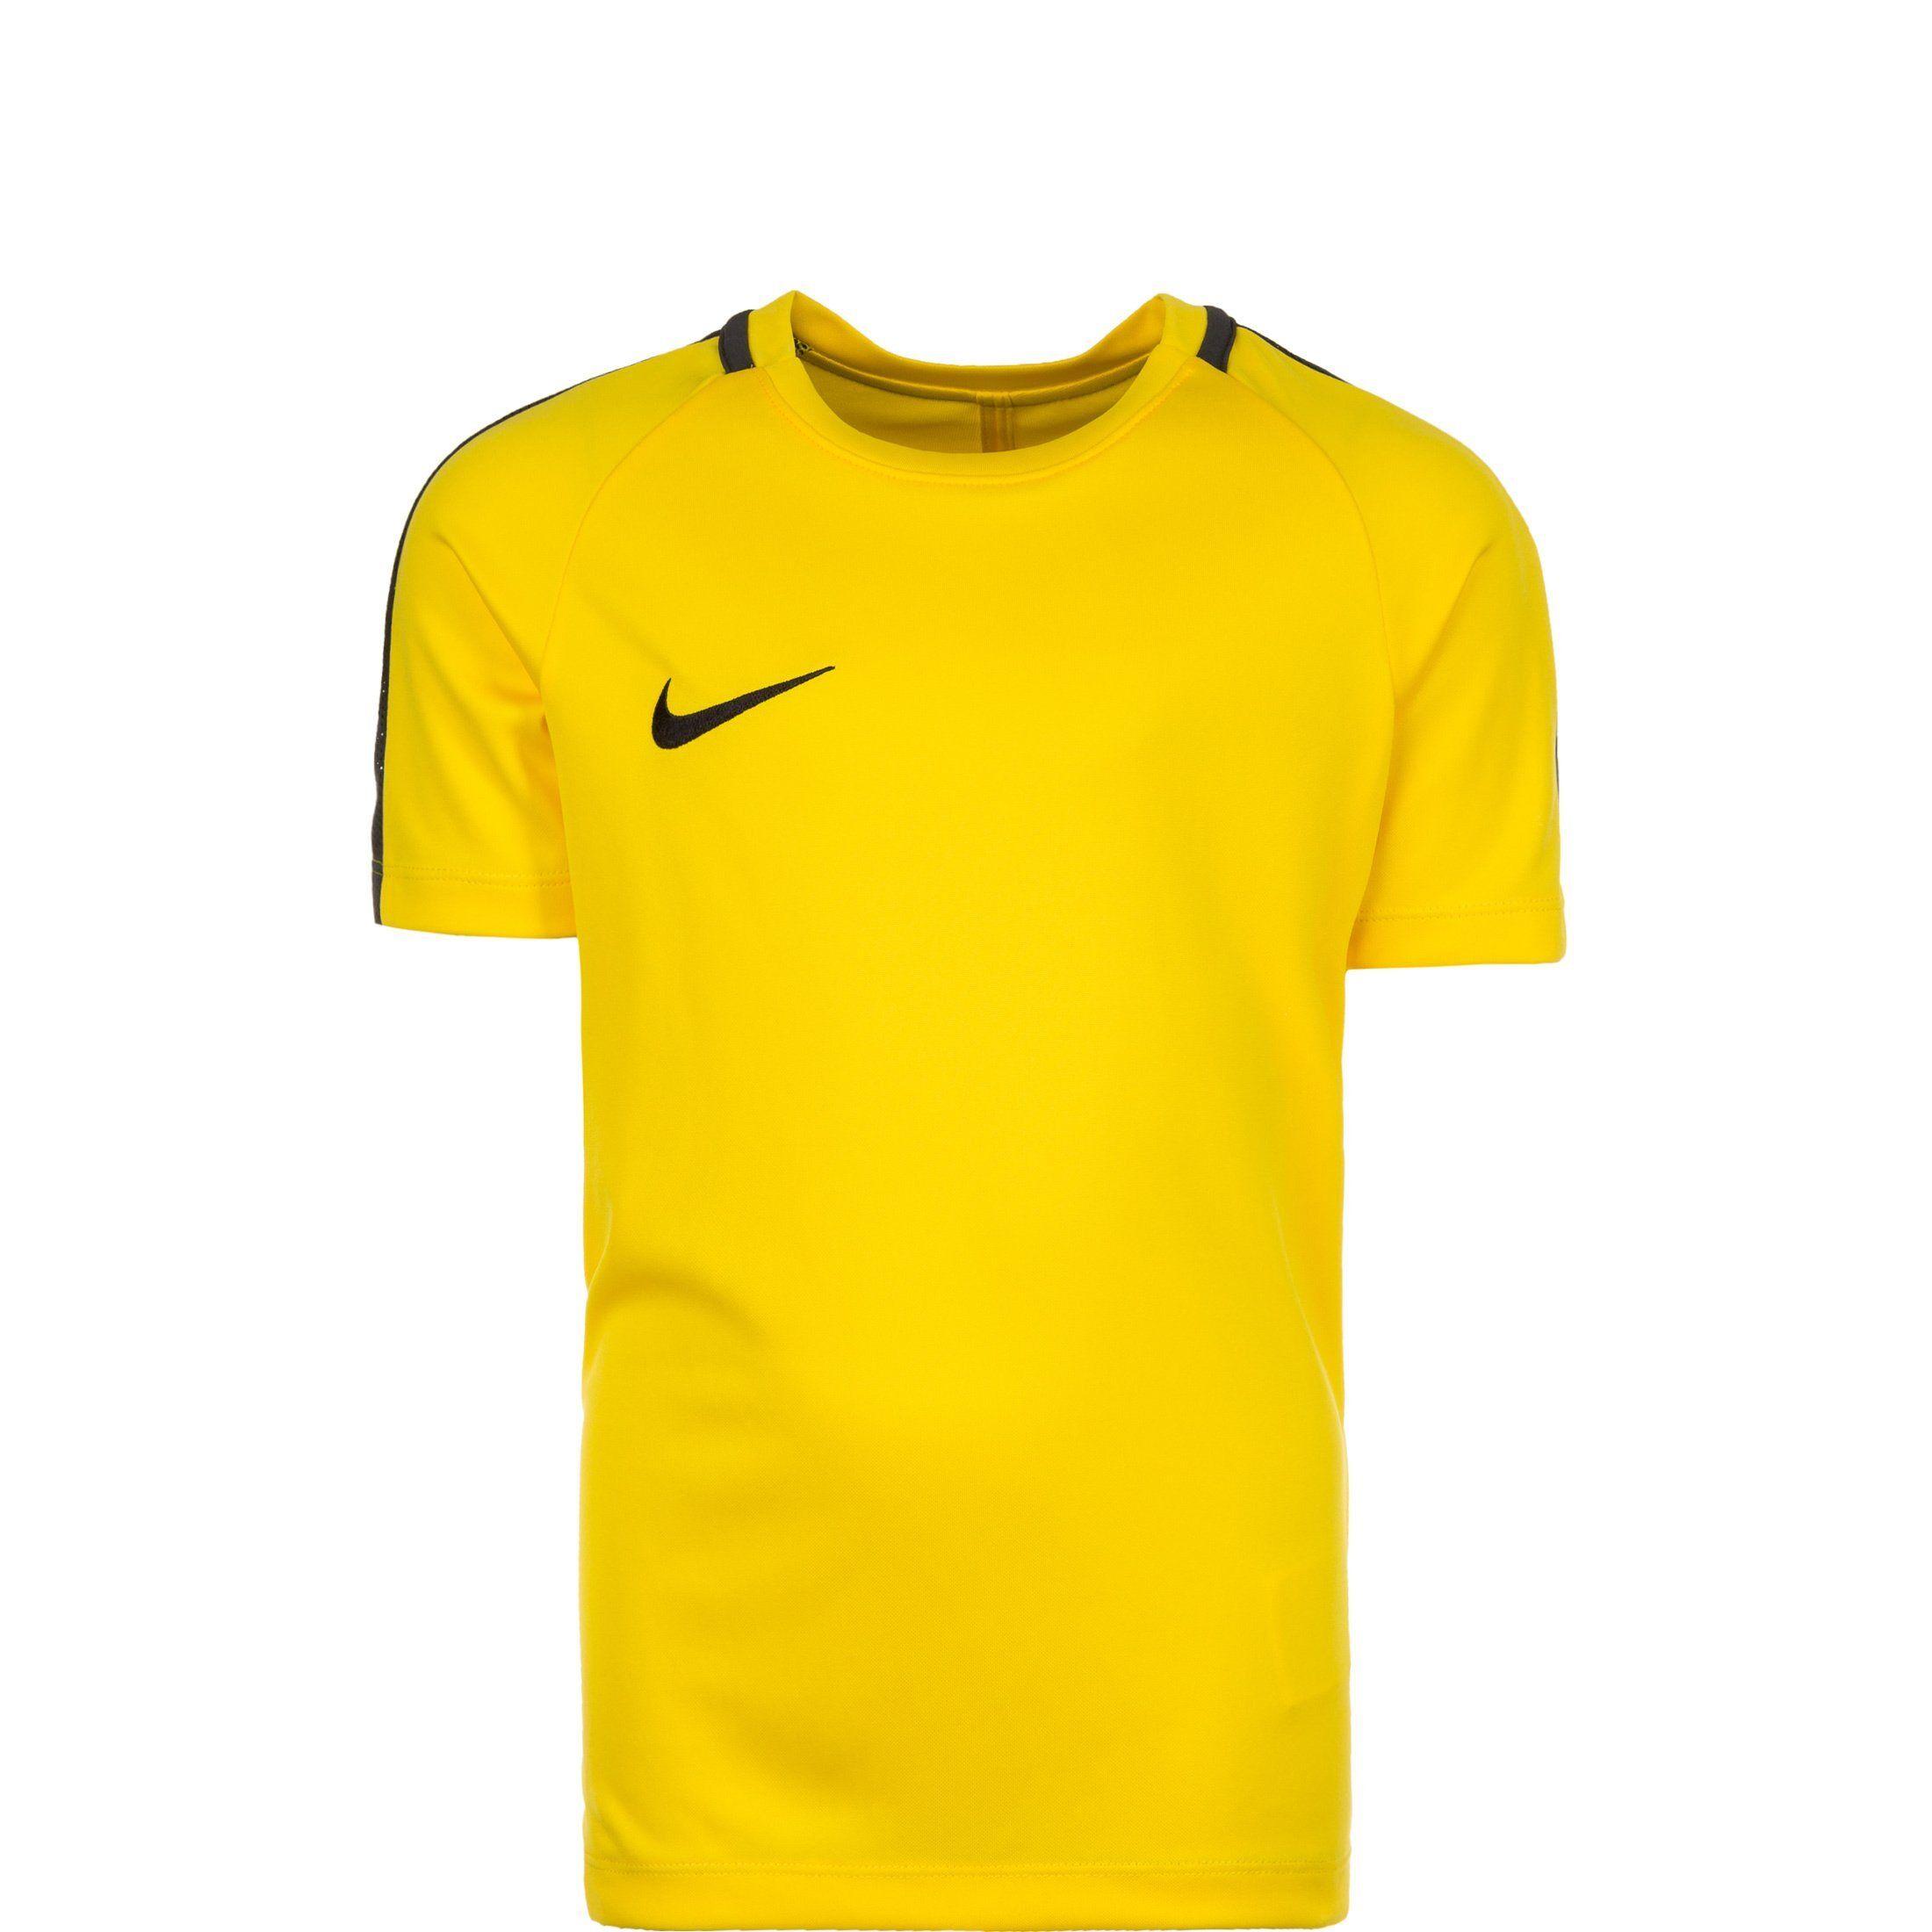 Nike Trainingsshirt »Dry Academy 18«, gelb